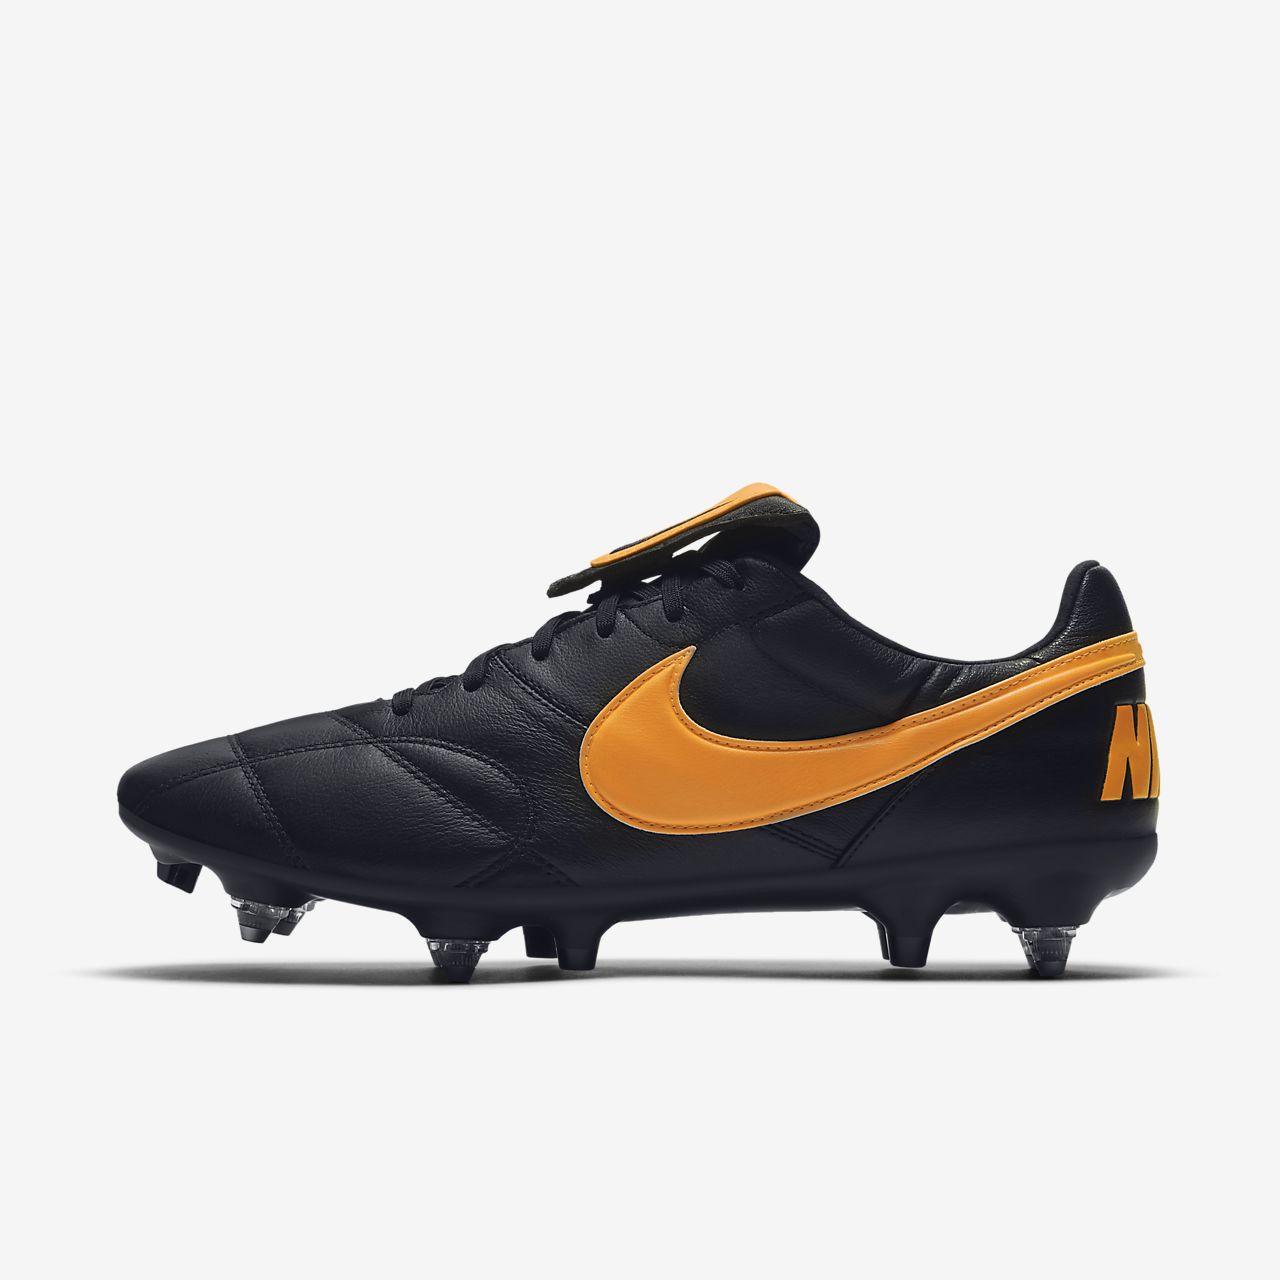 Chuteiras de futebol para terreno mole Nike Premier II Anti-Clog Traction SG-PRO